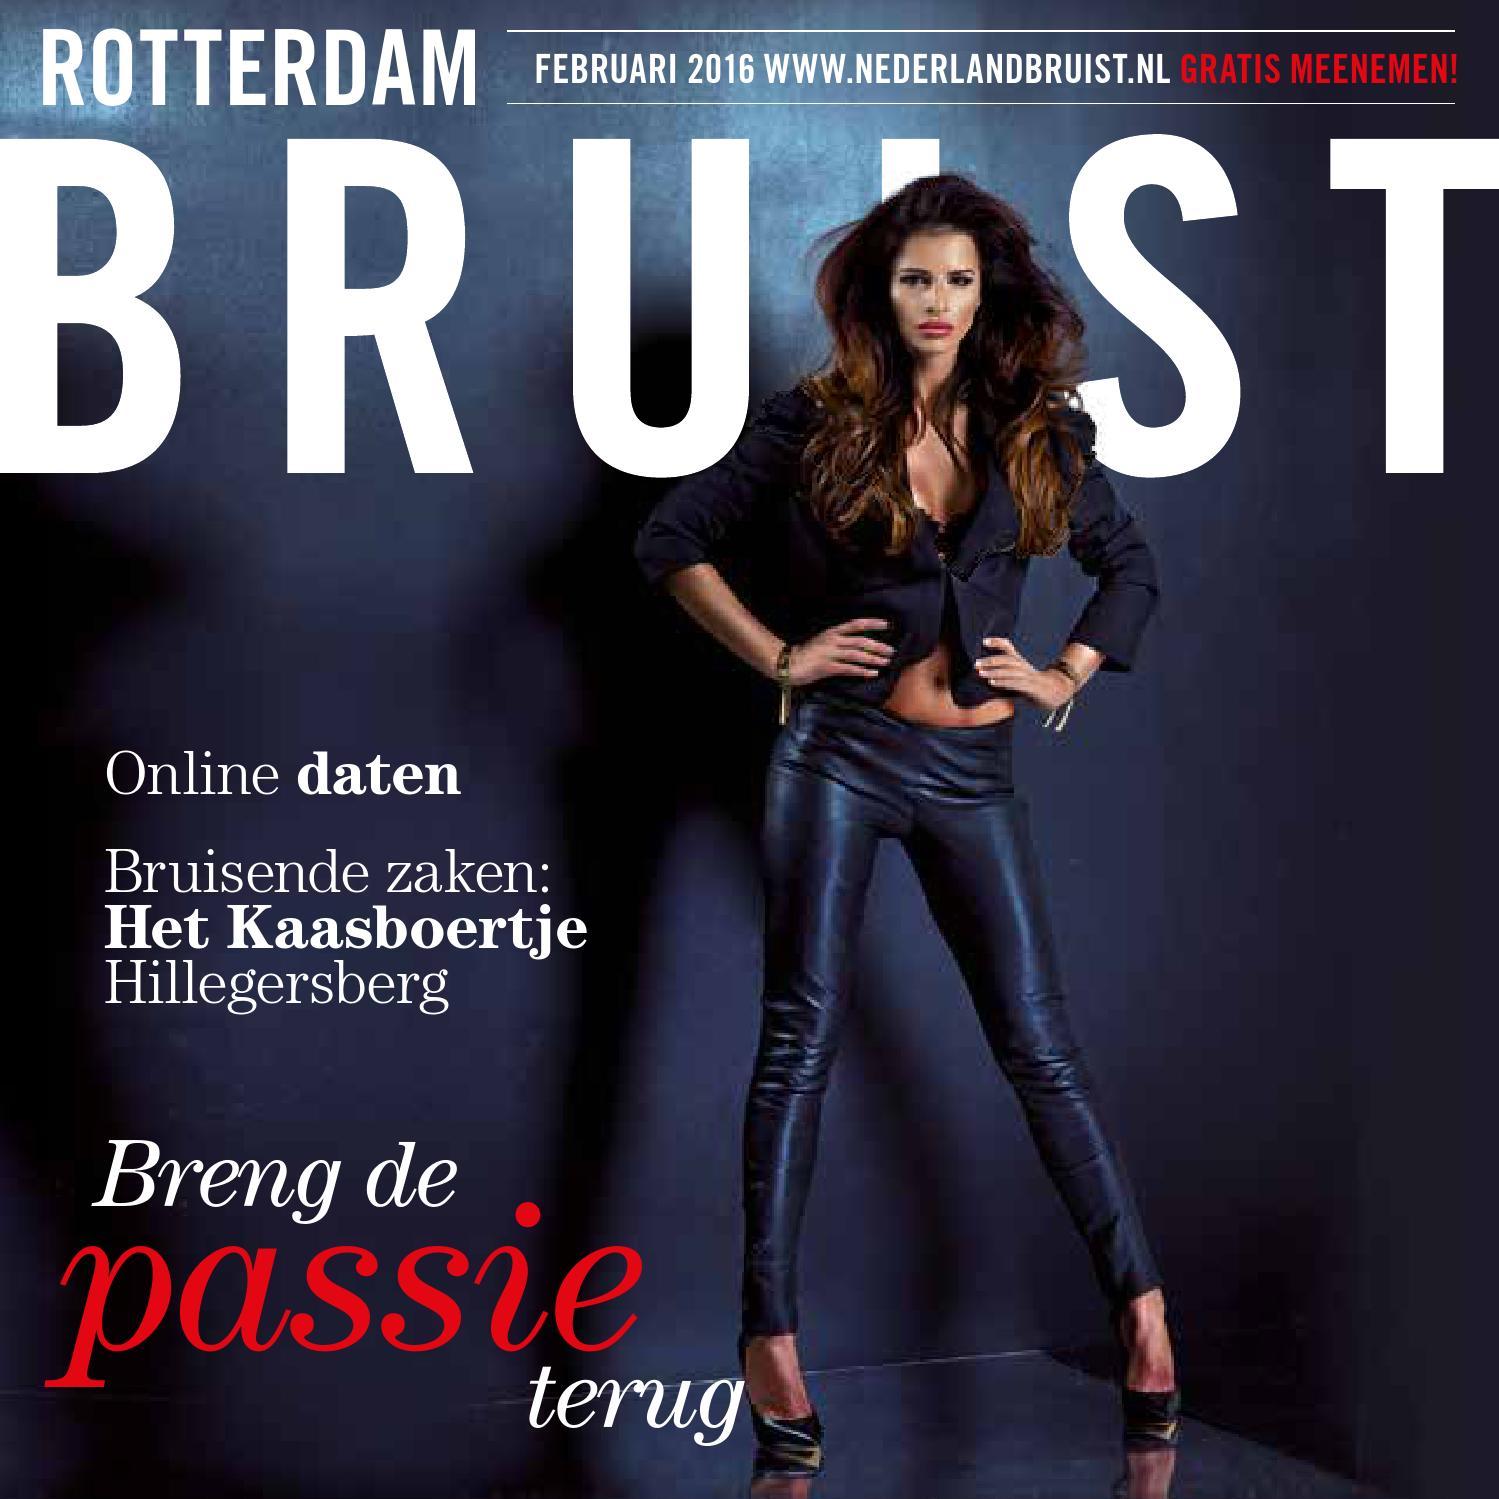 gratis dating nl rotterdam